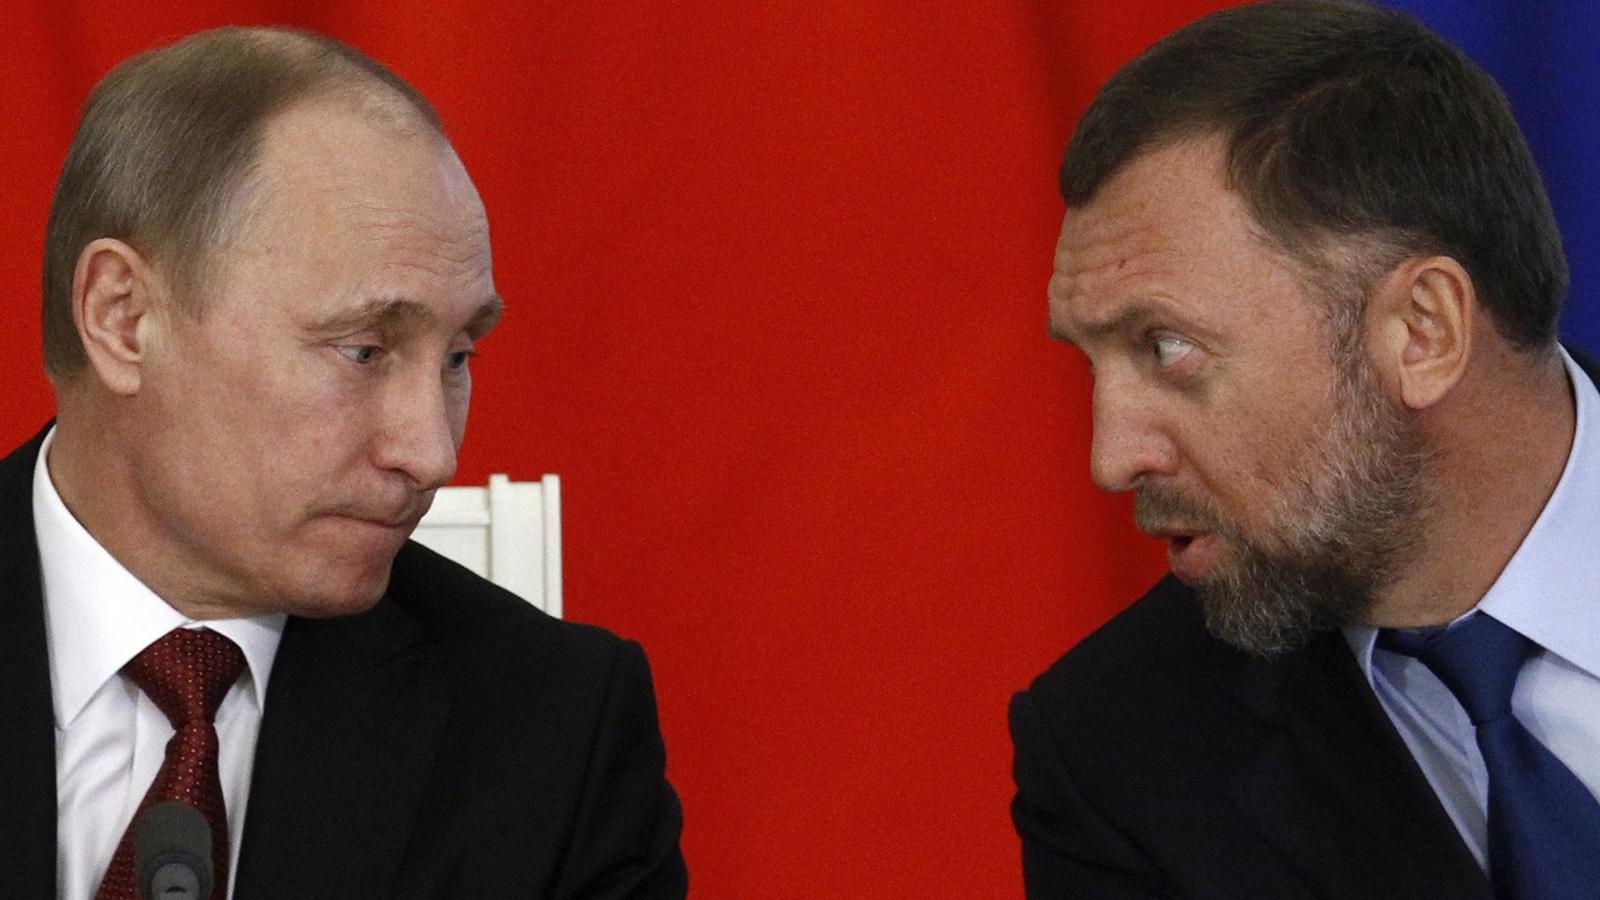 Estados Unidos sanciona empresarios rusos cercanos a Putin